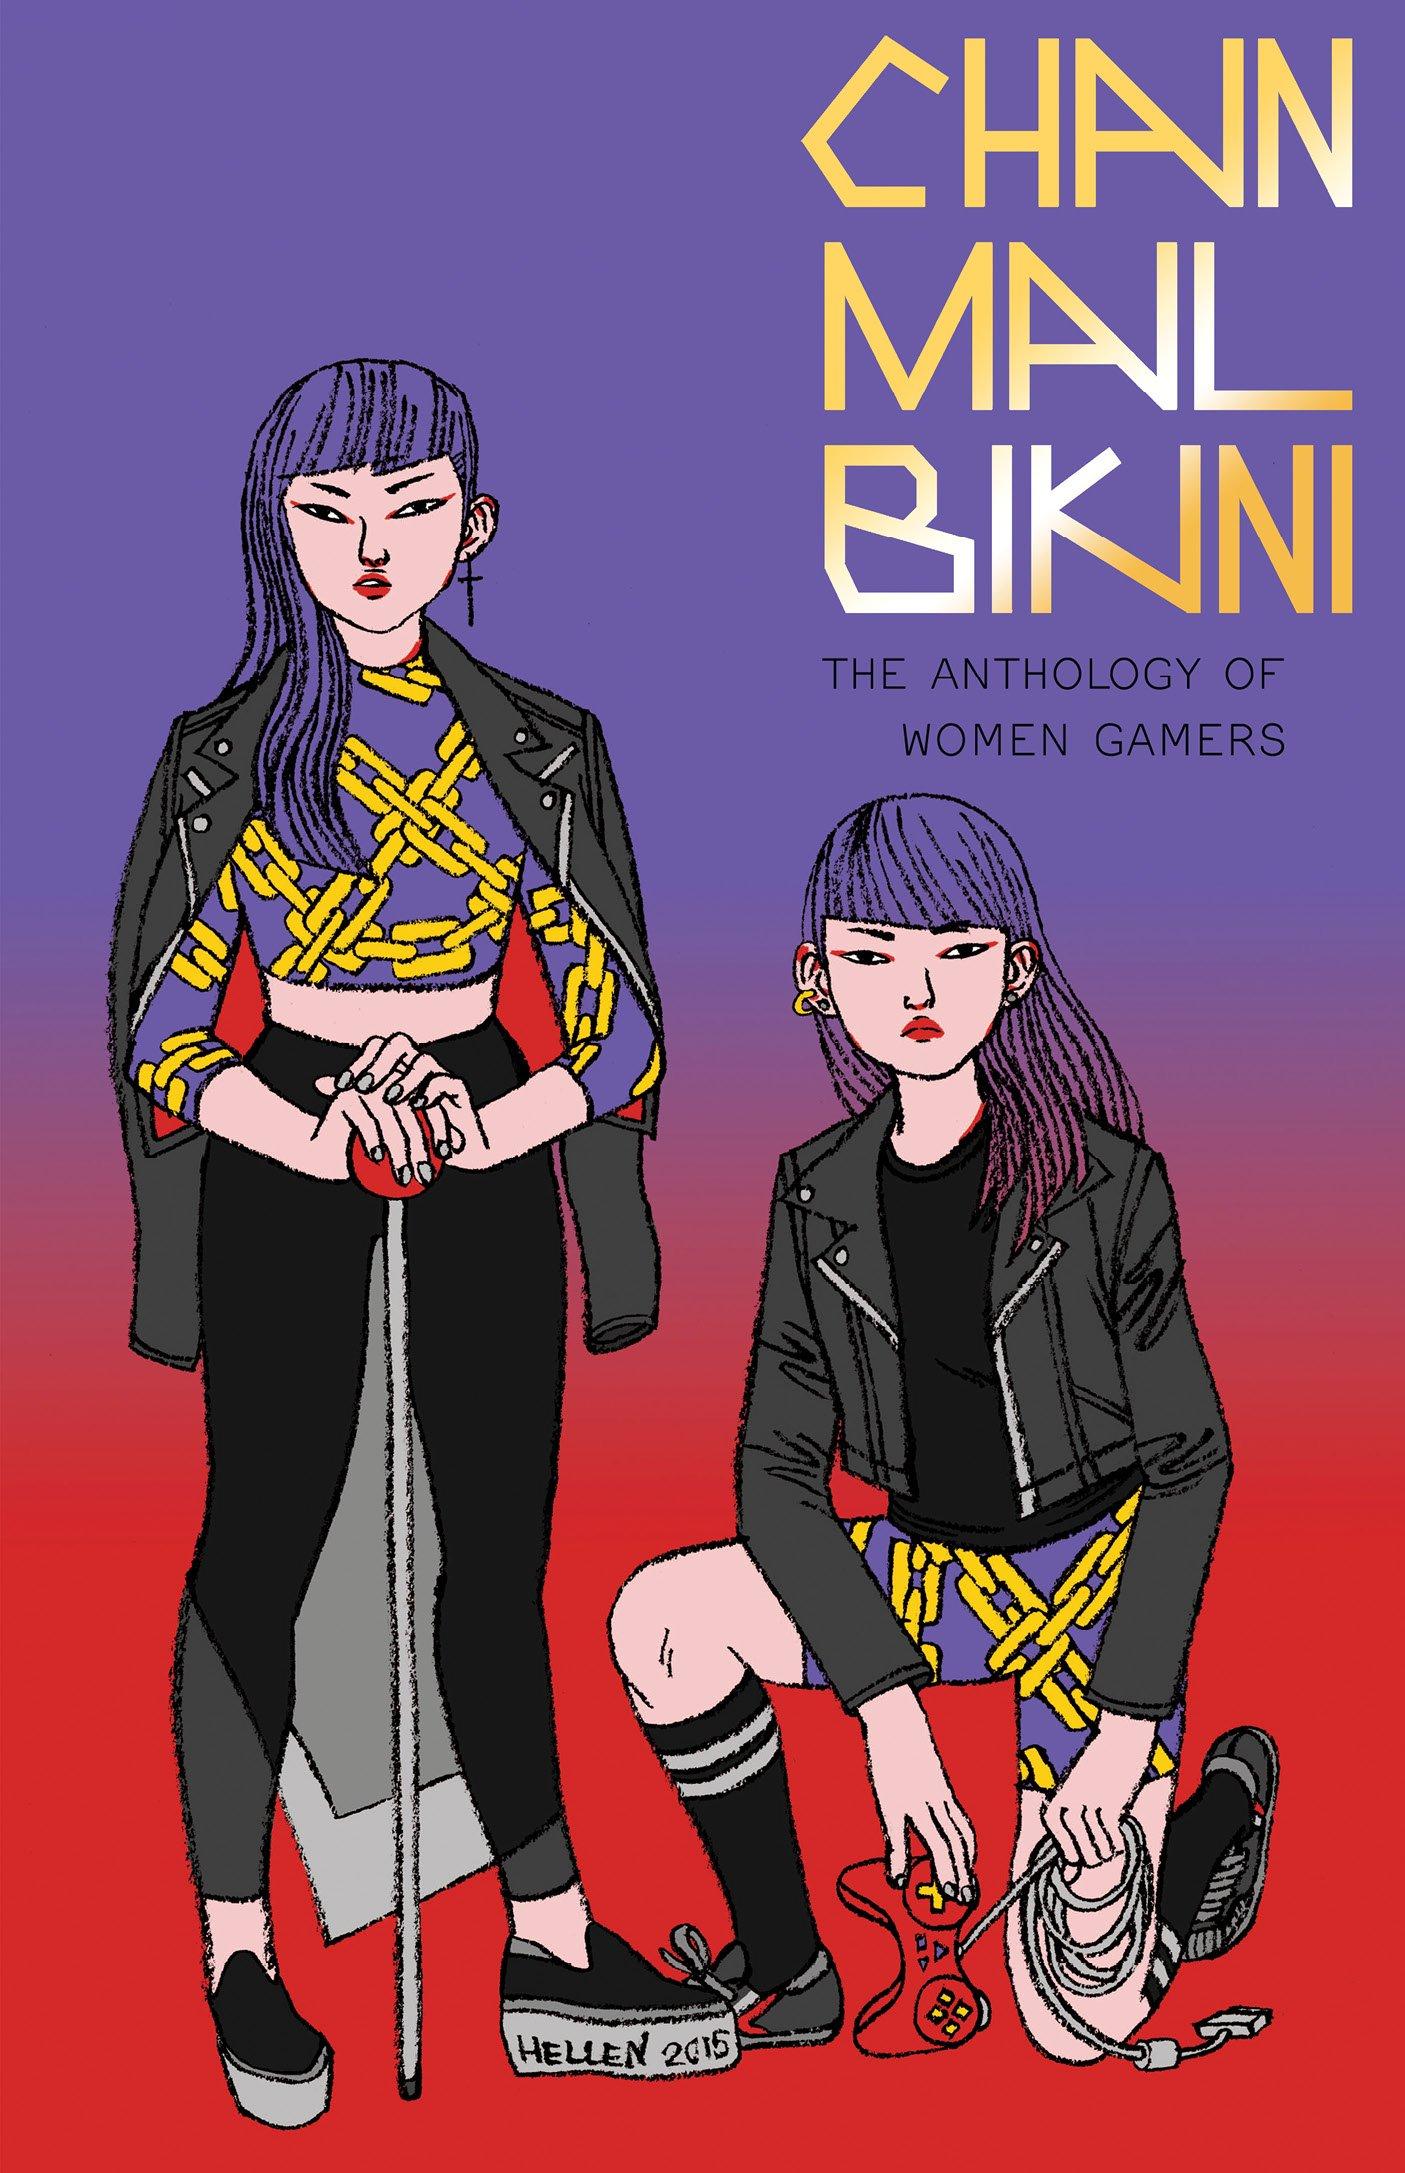 b90577cb29 Chainmail Bikini  The Anthology of Women Gamers  Hazel Newlevant ...